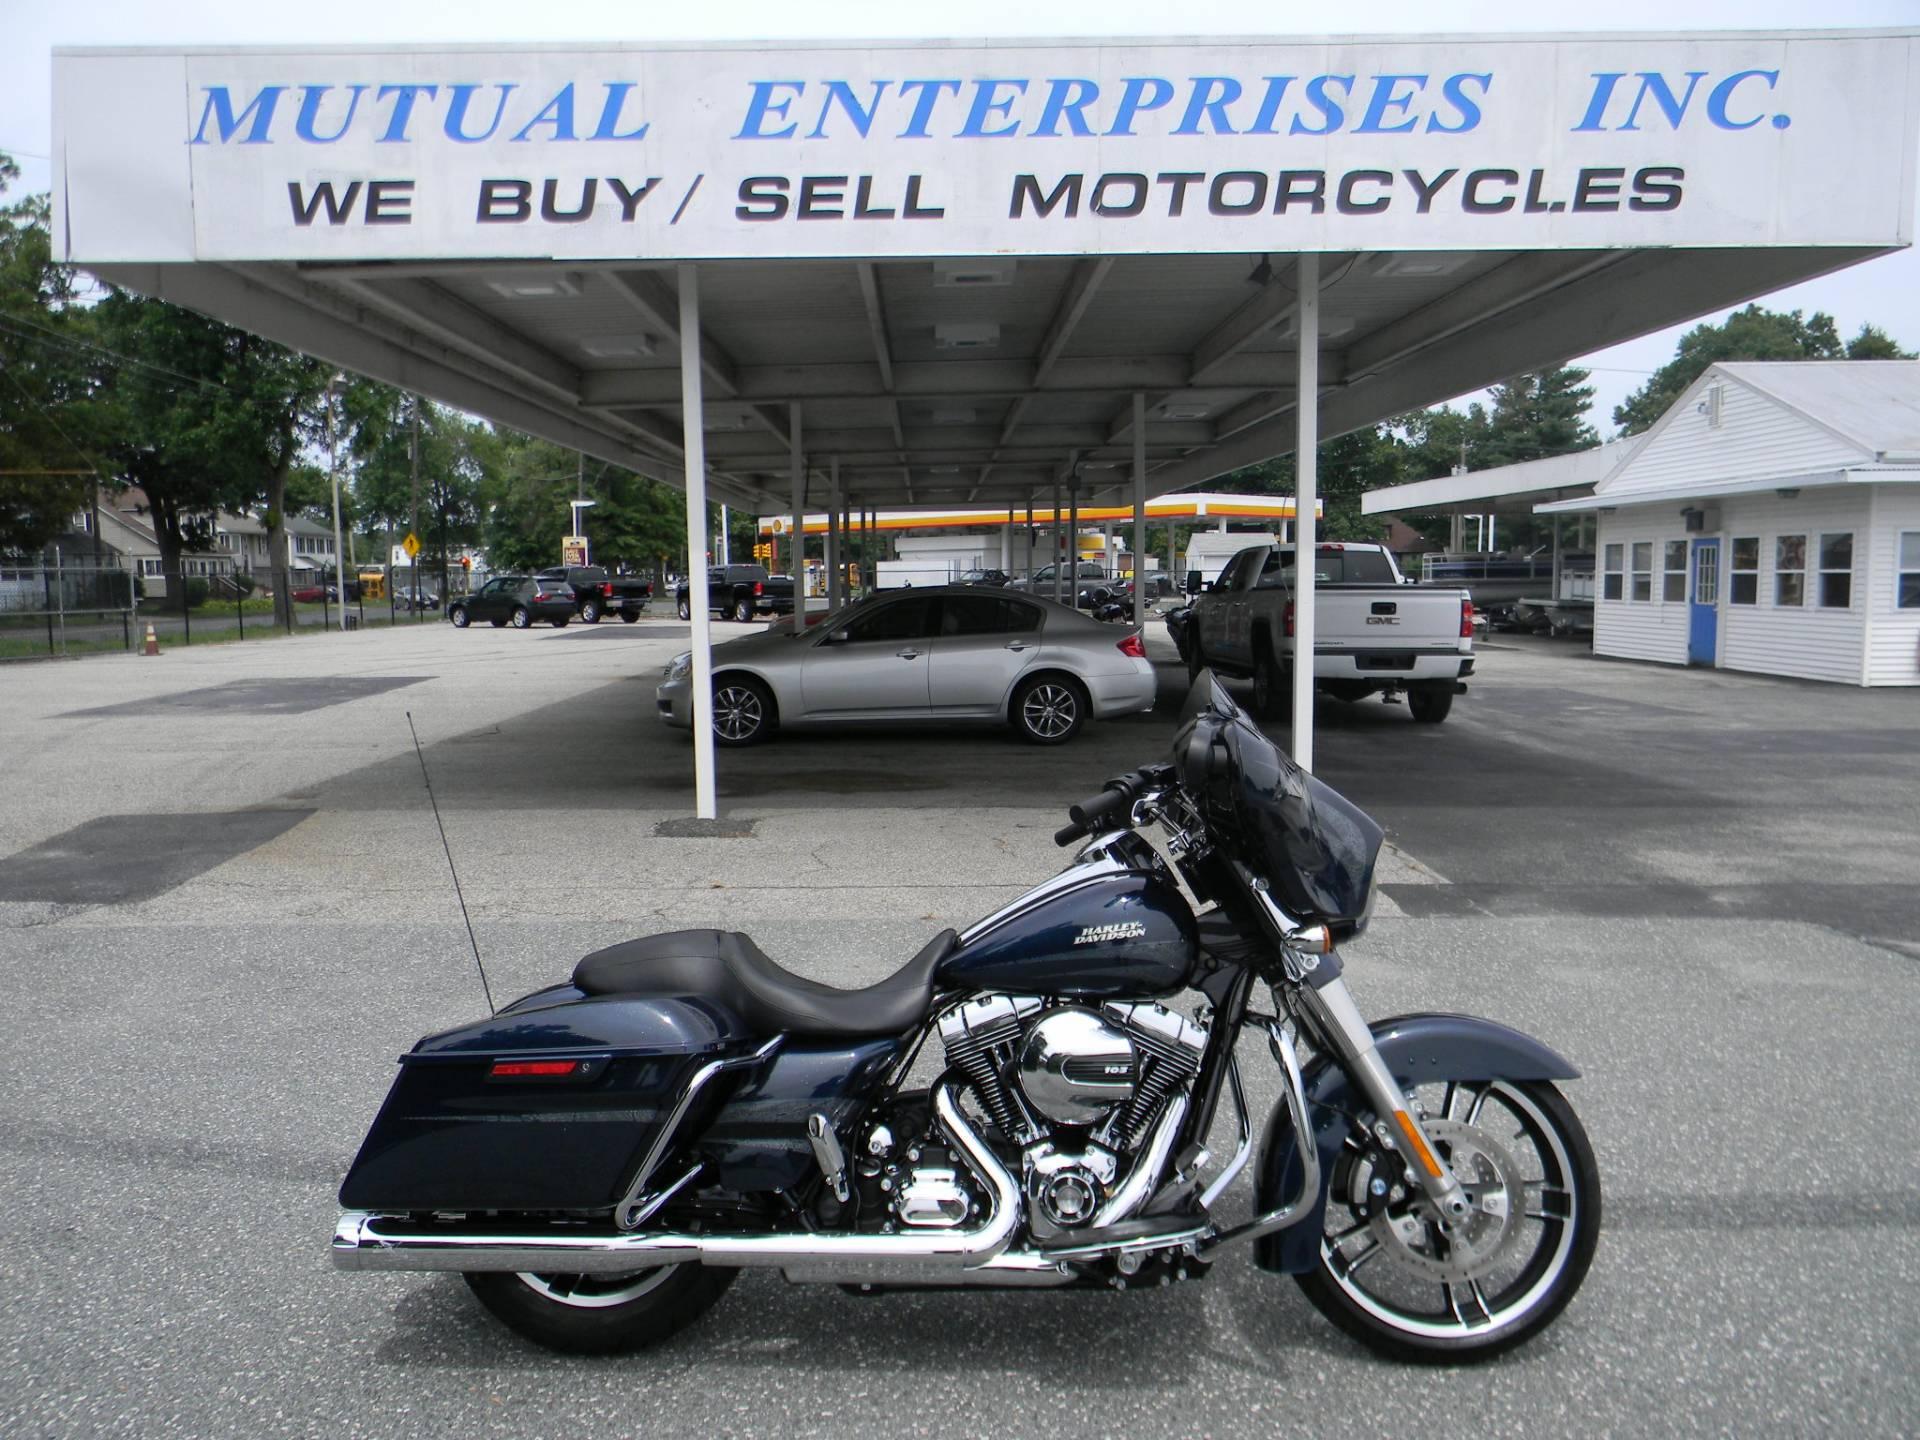 2016 Harley Davidson Street Glide Special In Springfield Machusetts